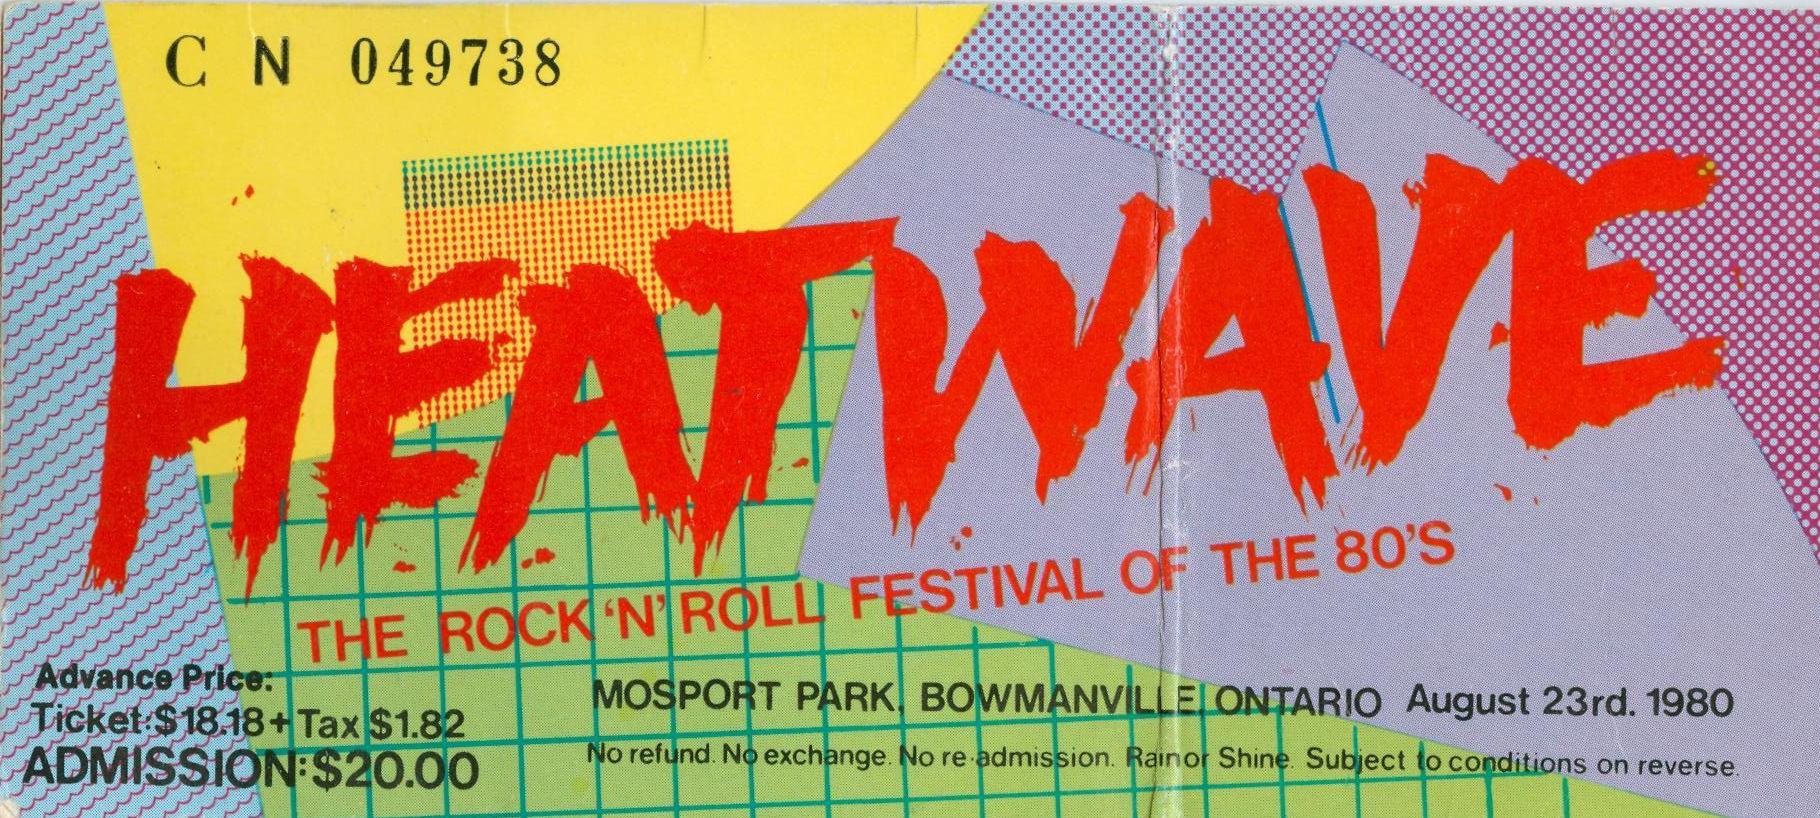 Heatwave Festival Ticket, August 23, 1980, Canada, mylifeinconcert.com